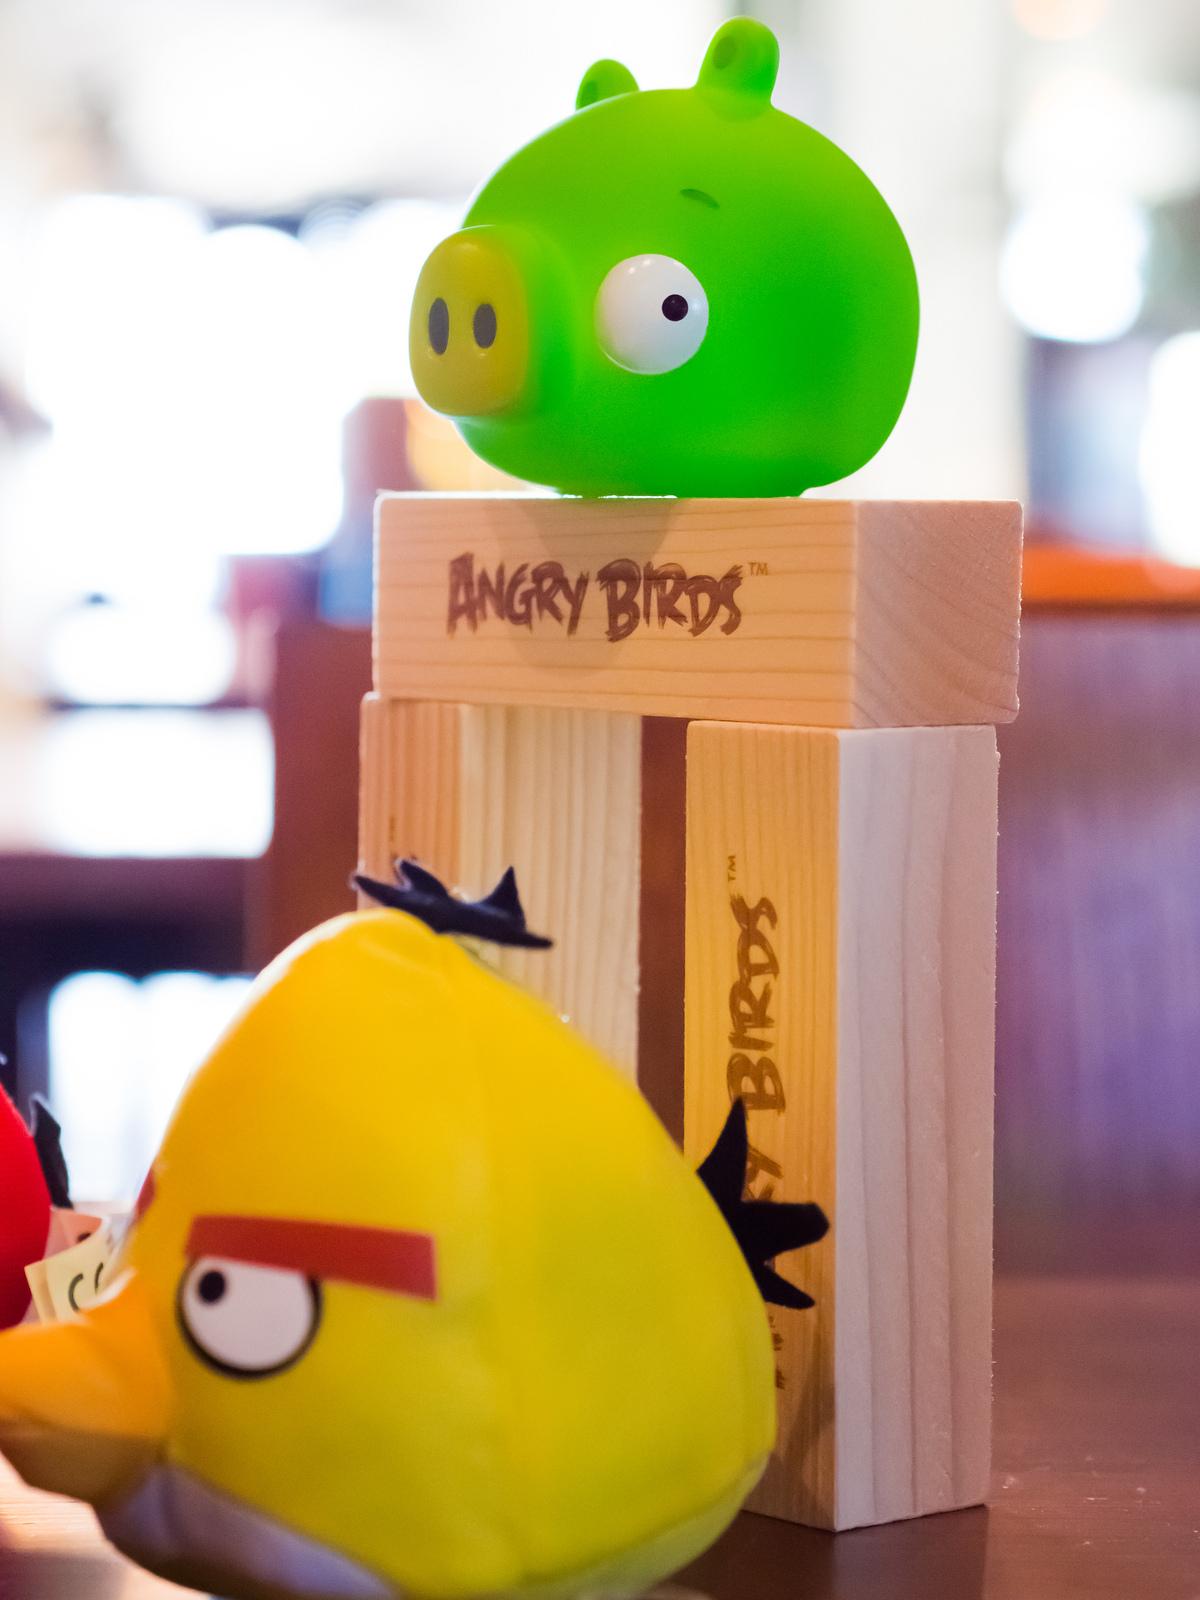 Angrybirds - Angry birds gioco da tavolo istruzioni ...